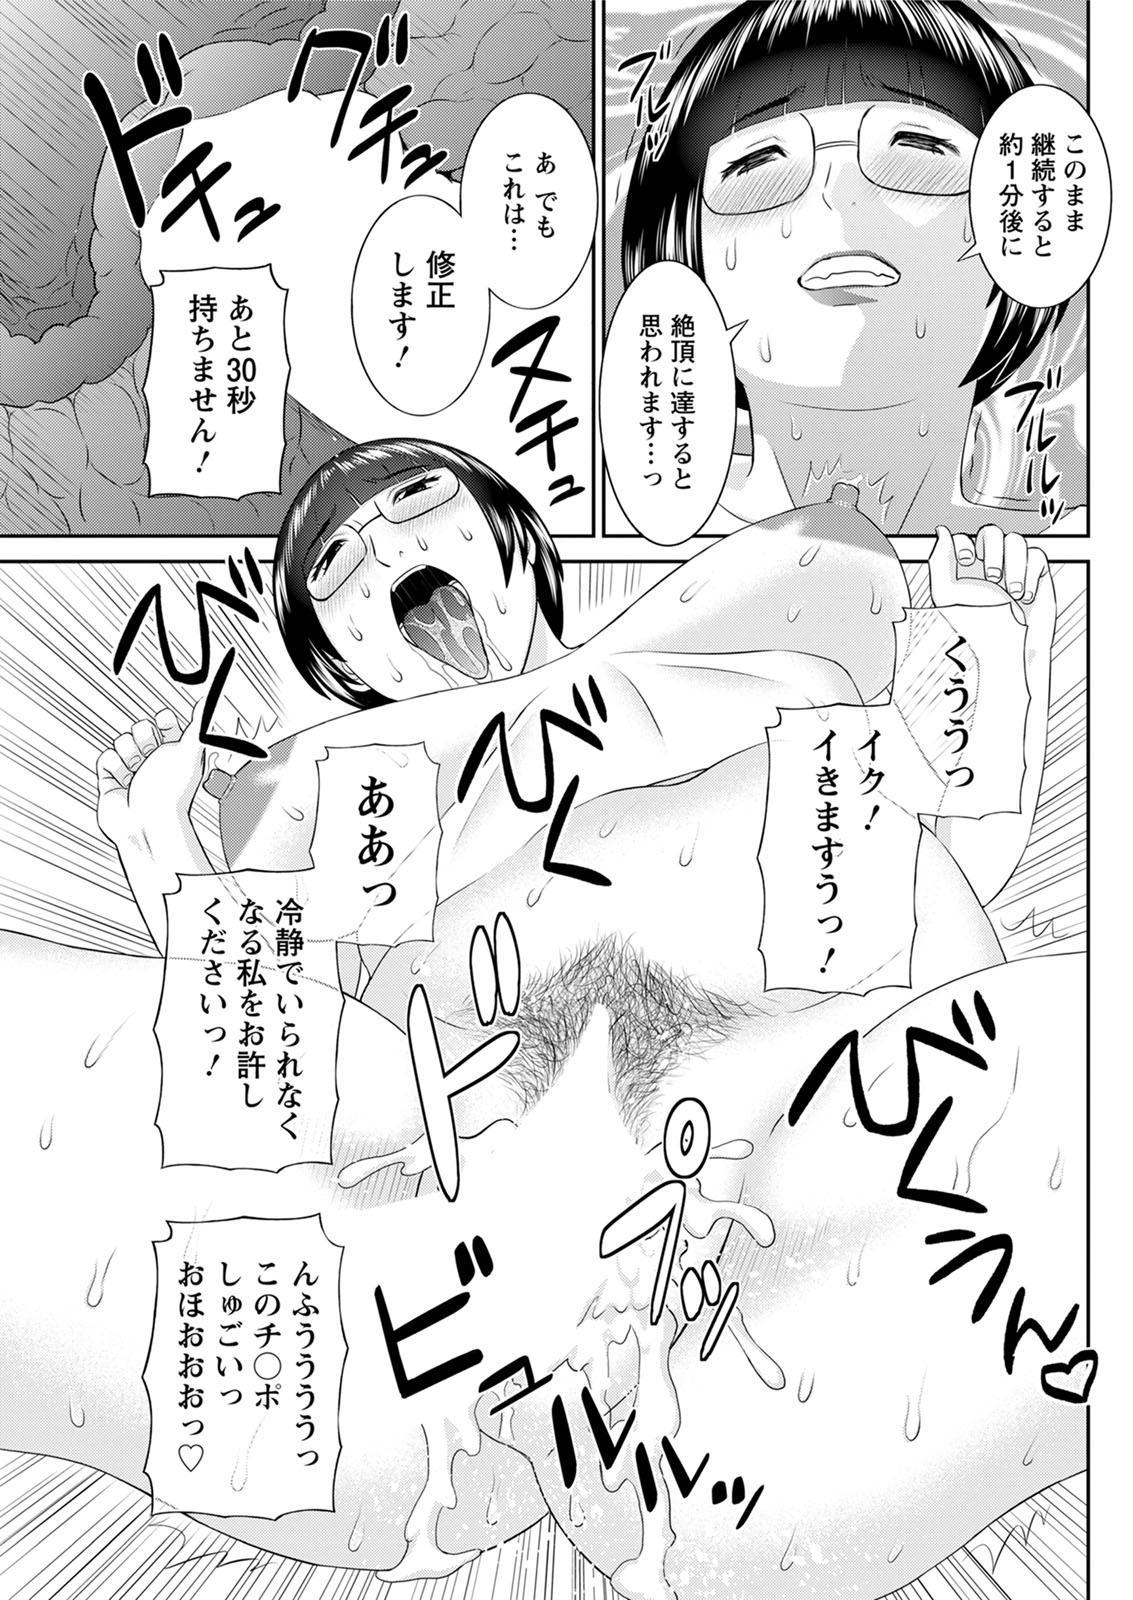 [Kawamori Misaki] Kaikan Hitotsuma Gakuen Ch. 1-6, 8-16 [Digital] 251